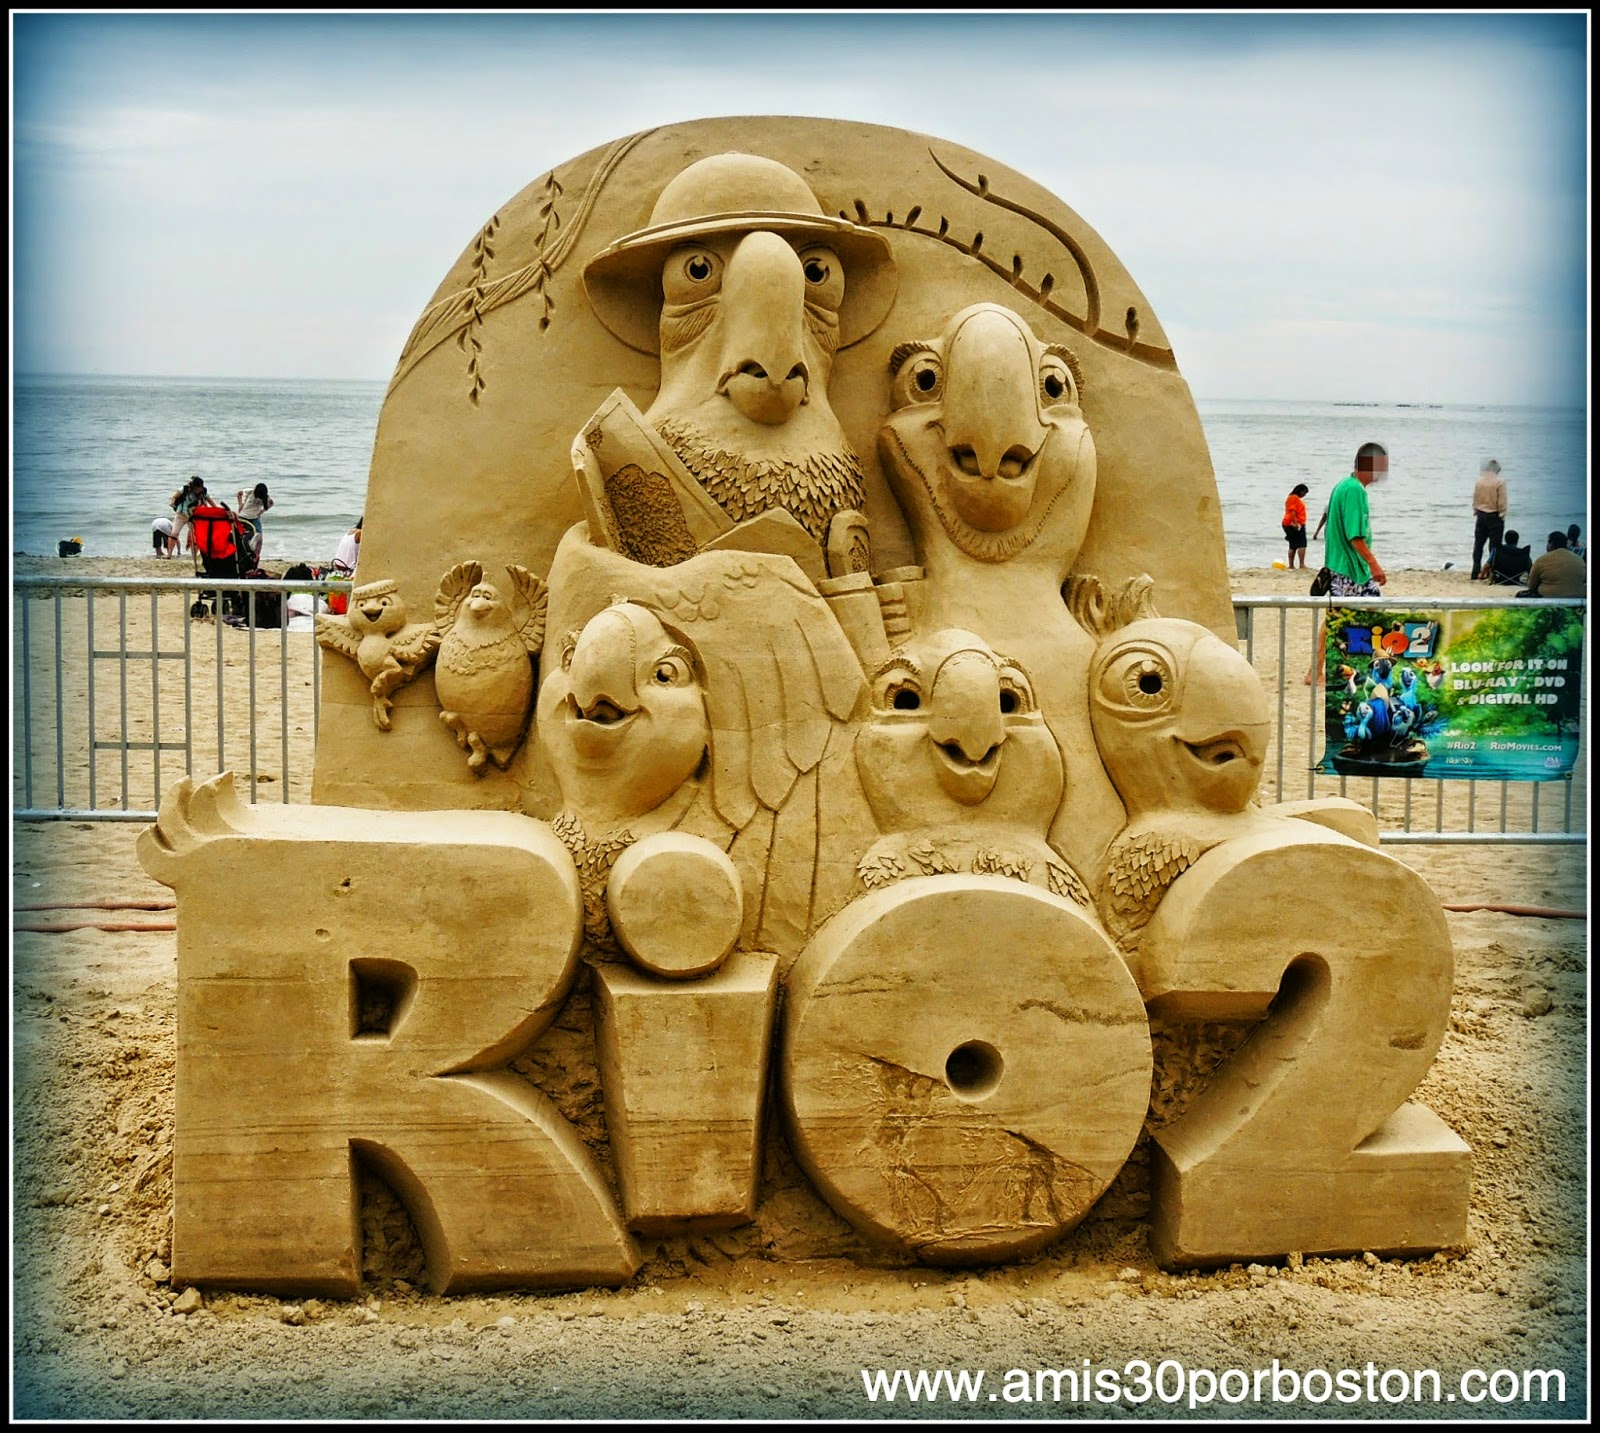 Revere Beach 2014 National Sand Sculpting Festival: Escultura del Sponsor